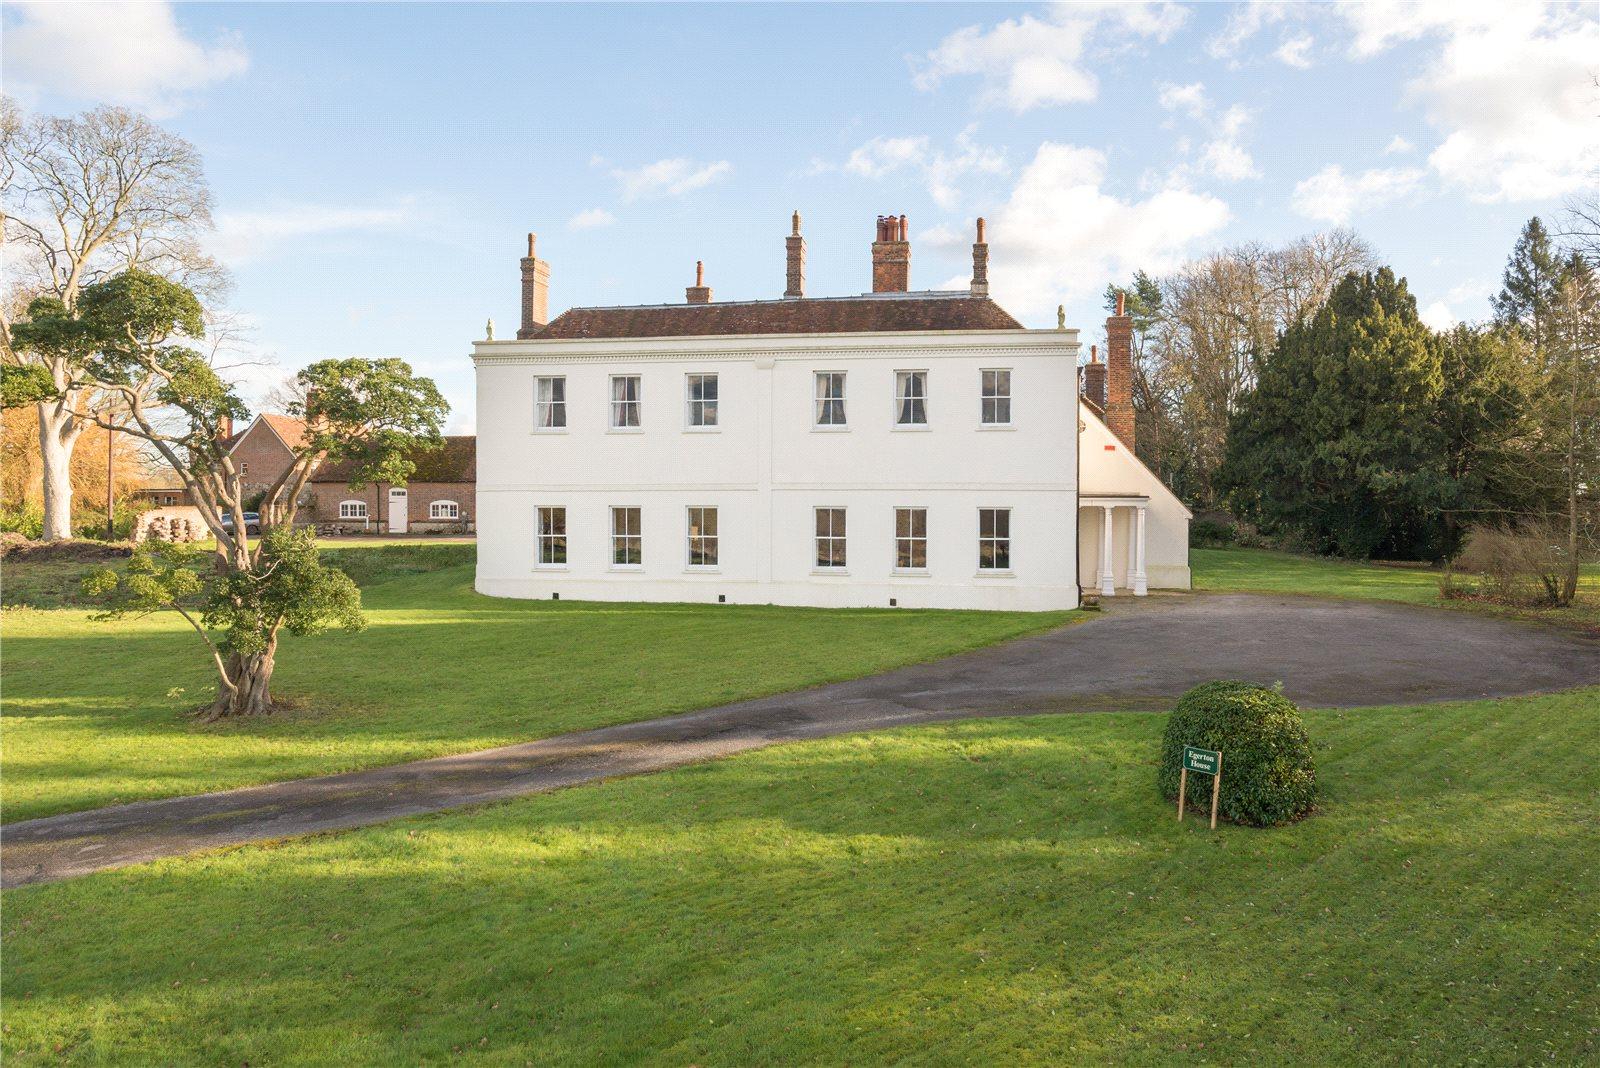 Single Family Home for Sale at Egerton House Road, Egerton, Ashford, Kent, TN27 Ashford, England